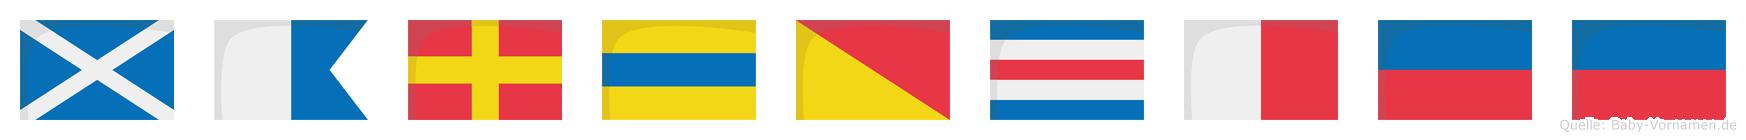 Mardochee im Flaggenalphabet